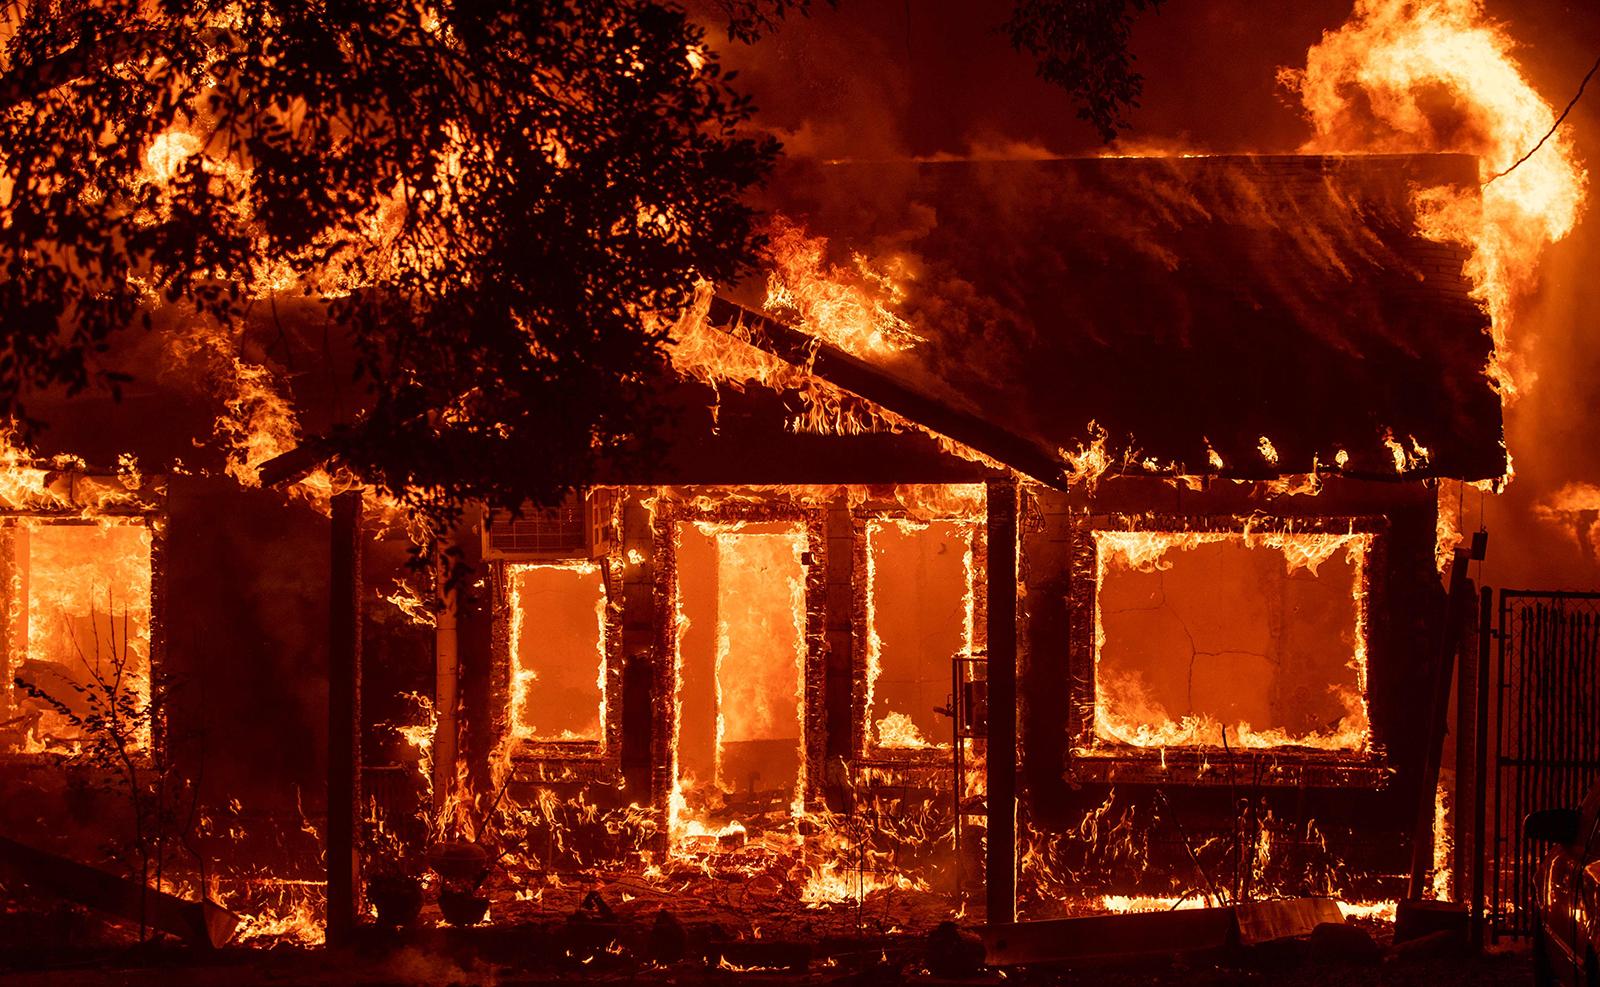 A home burns as the Camp fire tears through Paradise, California on November 8, 2018. AFP